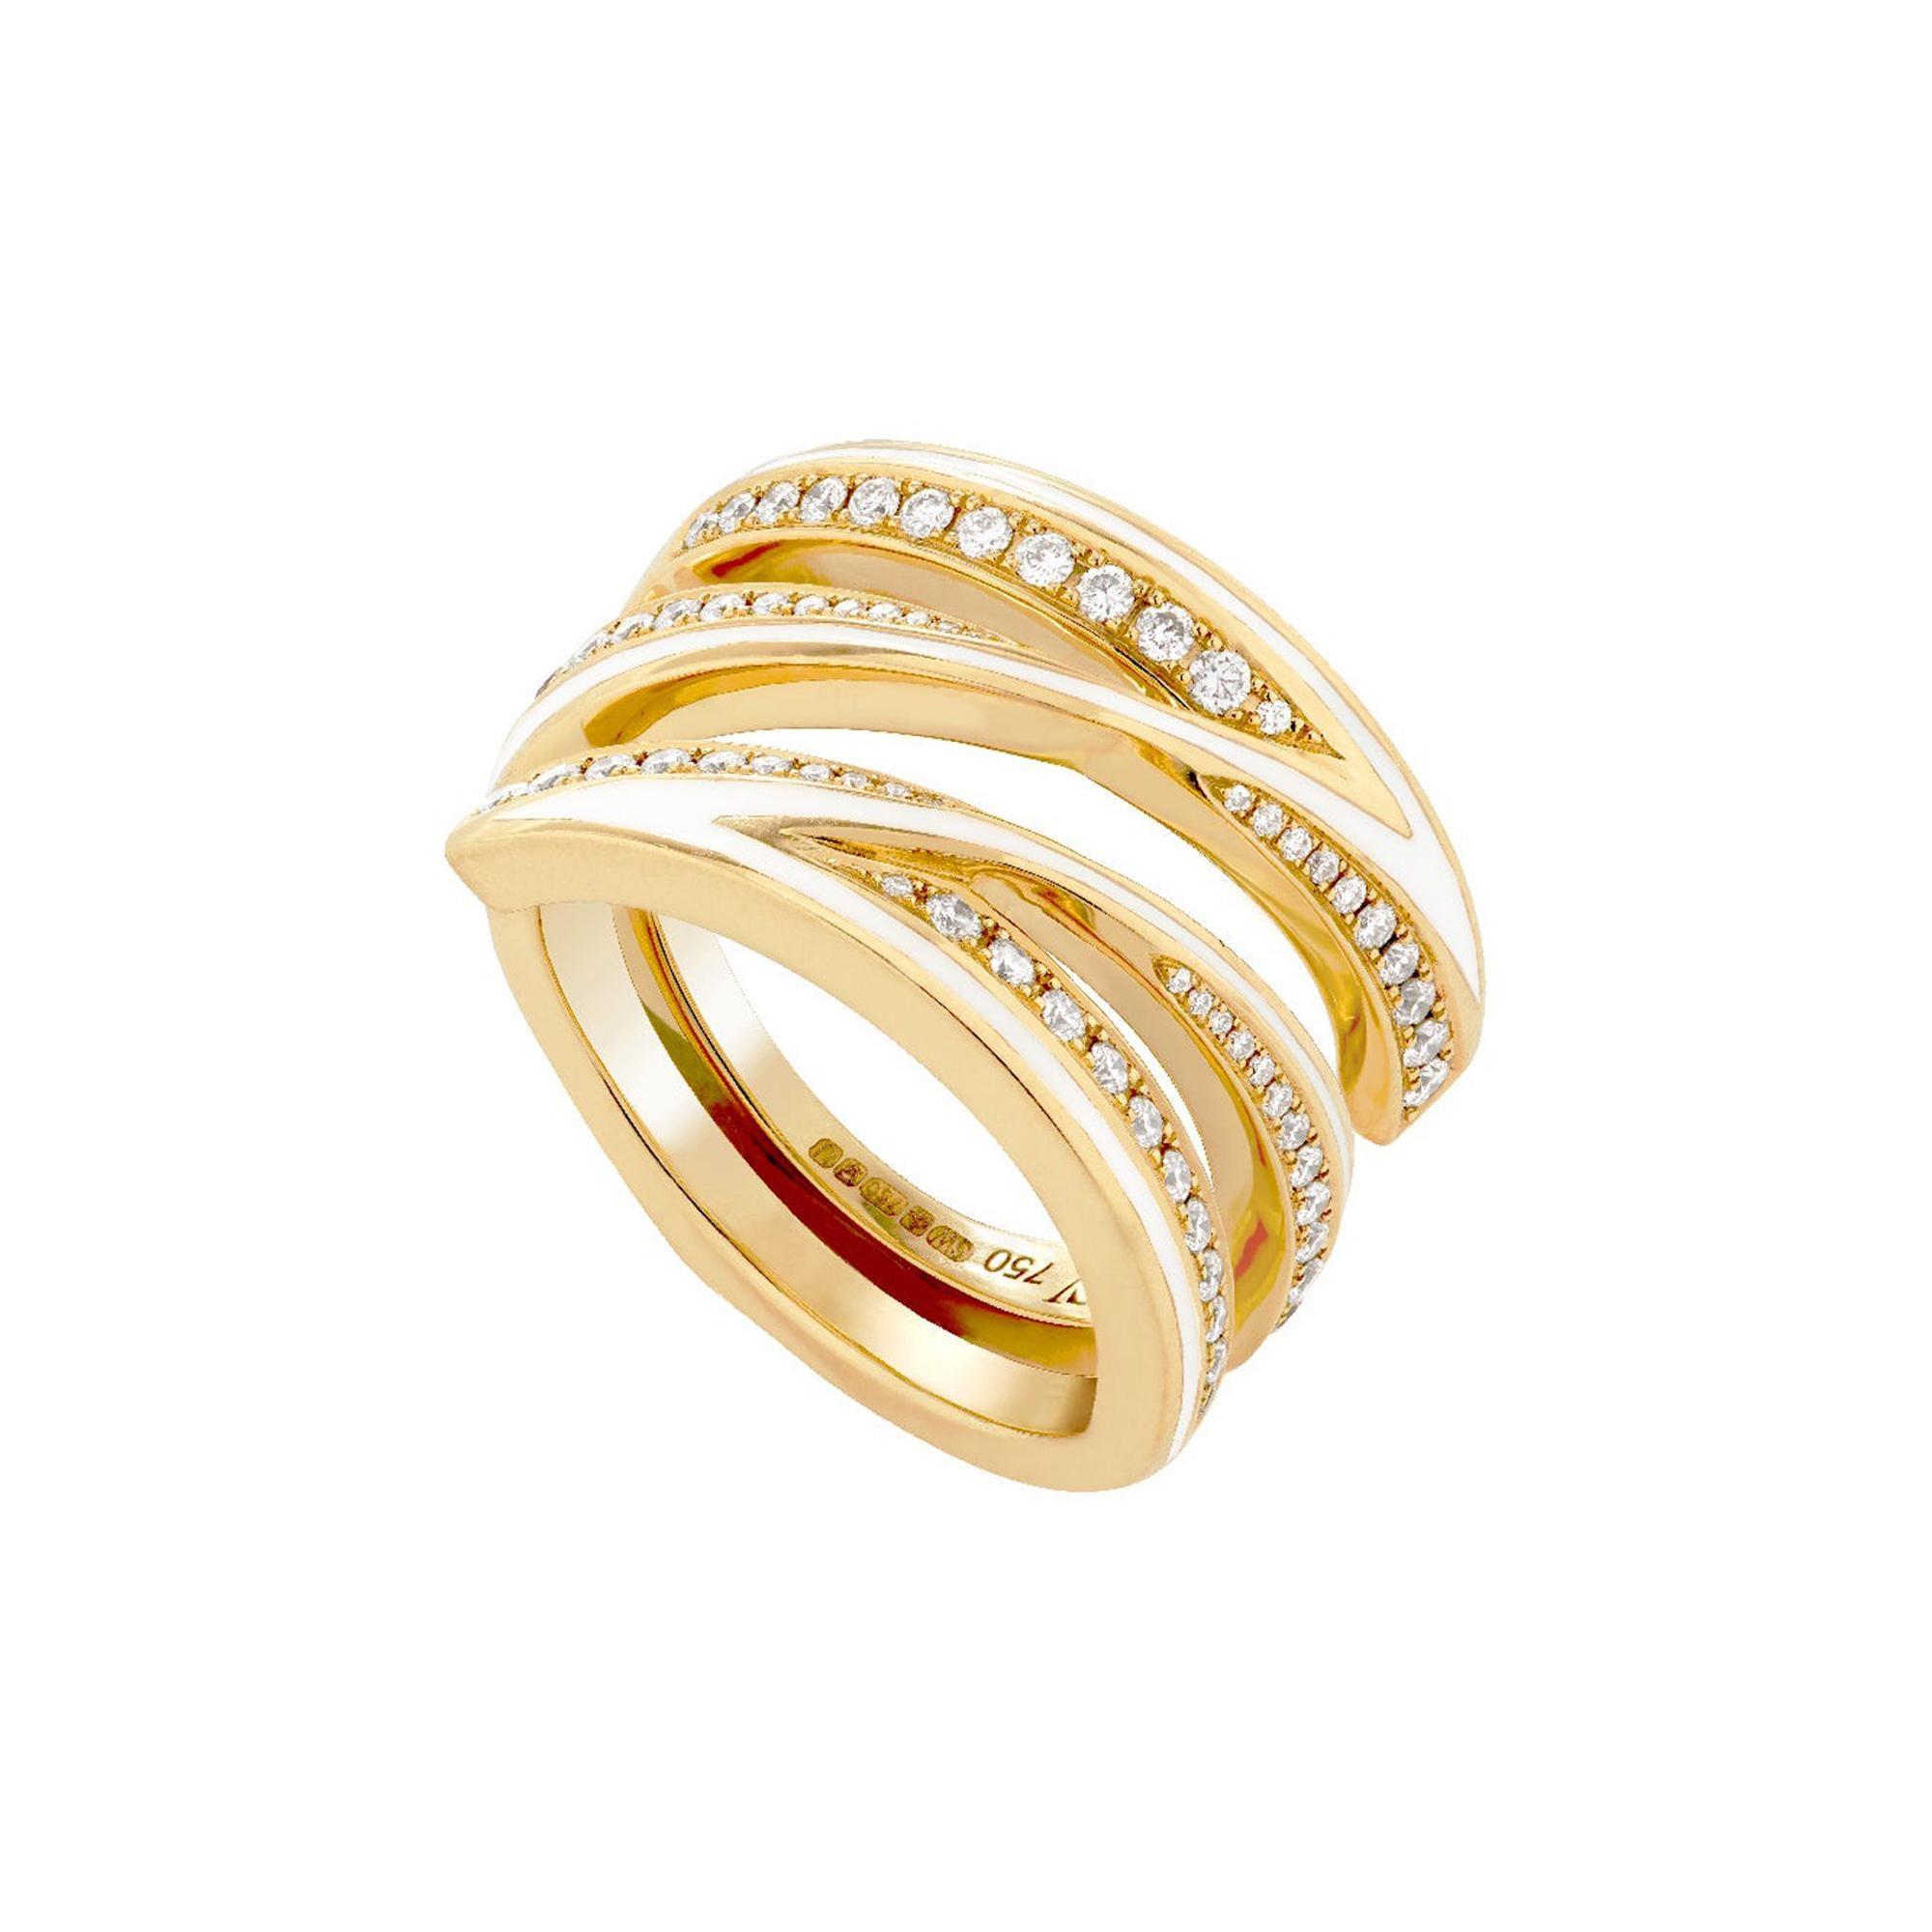 Stephen Webster Vertigo Infinity 18 Carat Gold and White Diamond '0.65 Ct' Ring